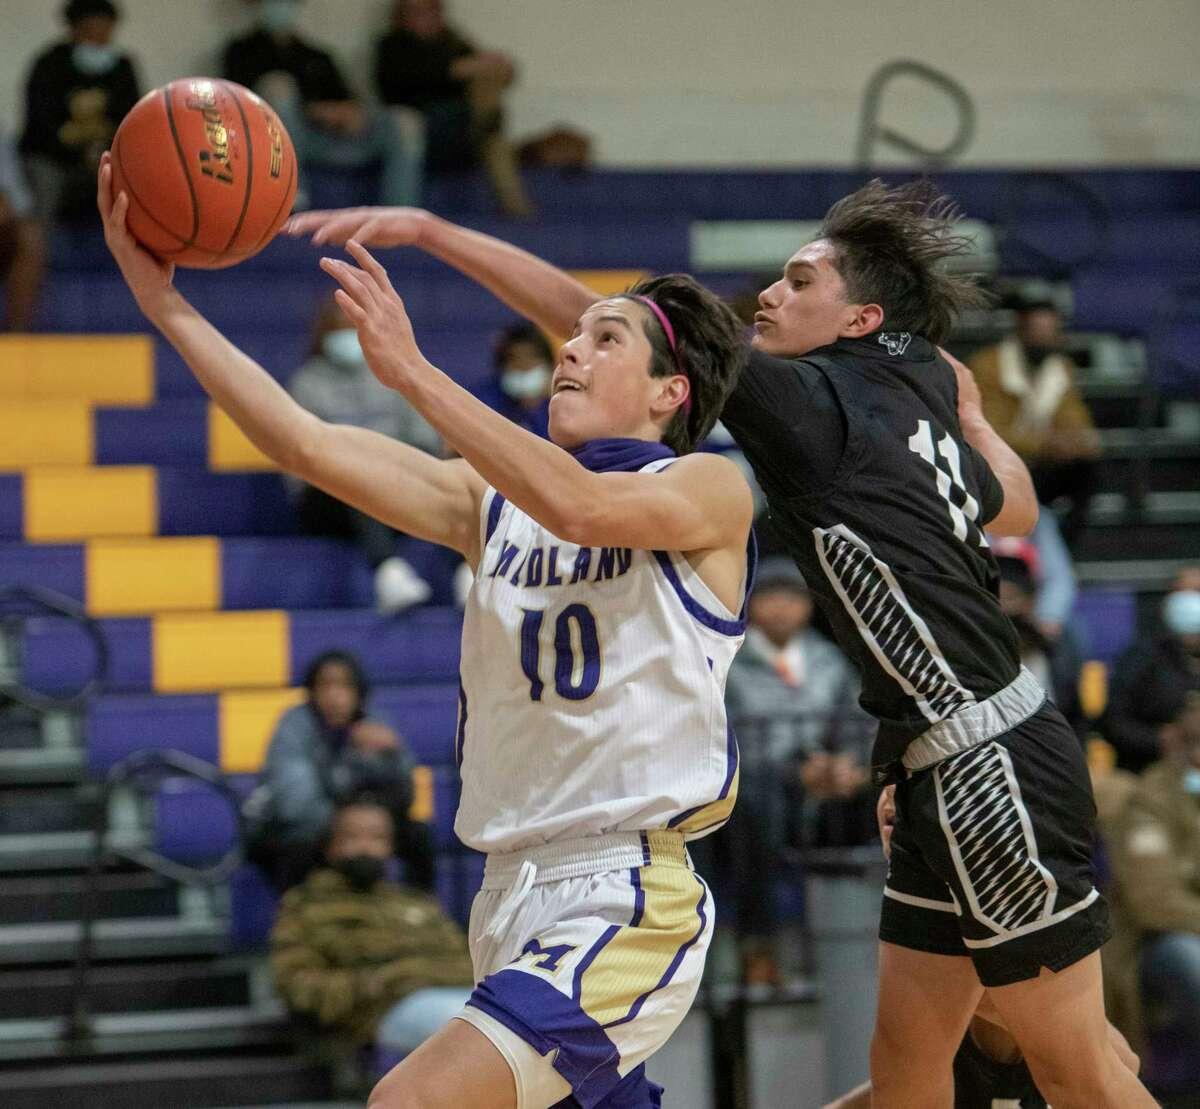 Midland High's Santiago Salcedo drives to the basket as Permian's Ben Salvidar tries to block him 01/01/2021 at Midland High gym. Tim Fischer/Reporter-Telegram